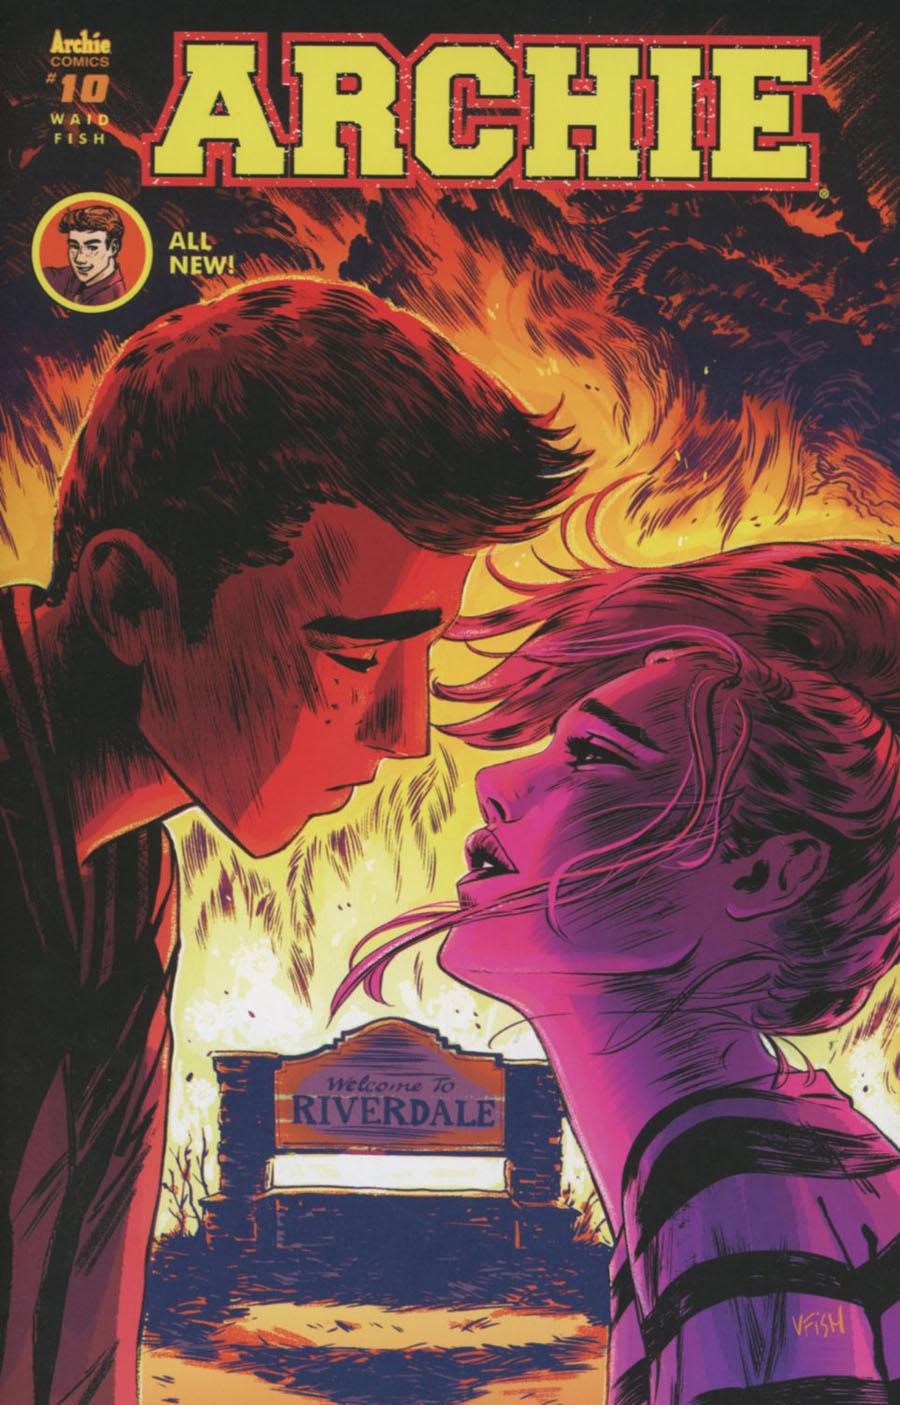 Archie Vol 2 #10 Cover A Regular Veronica Fish Cover